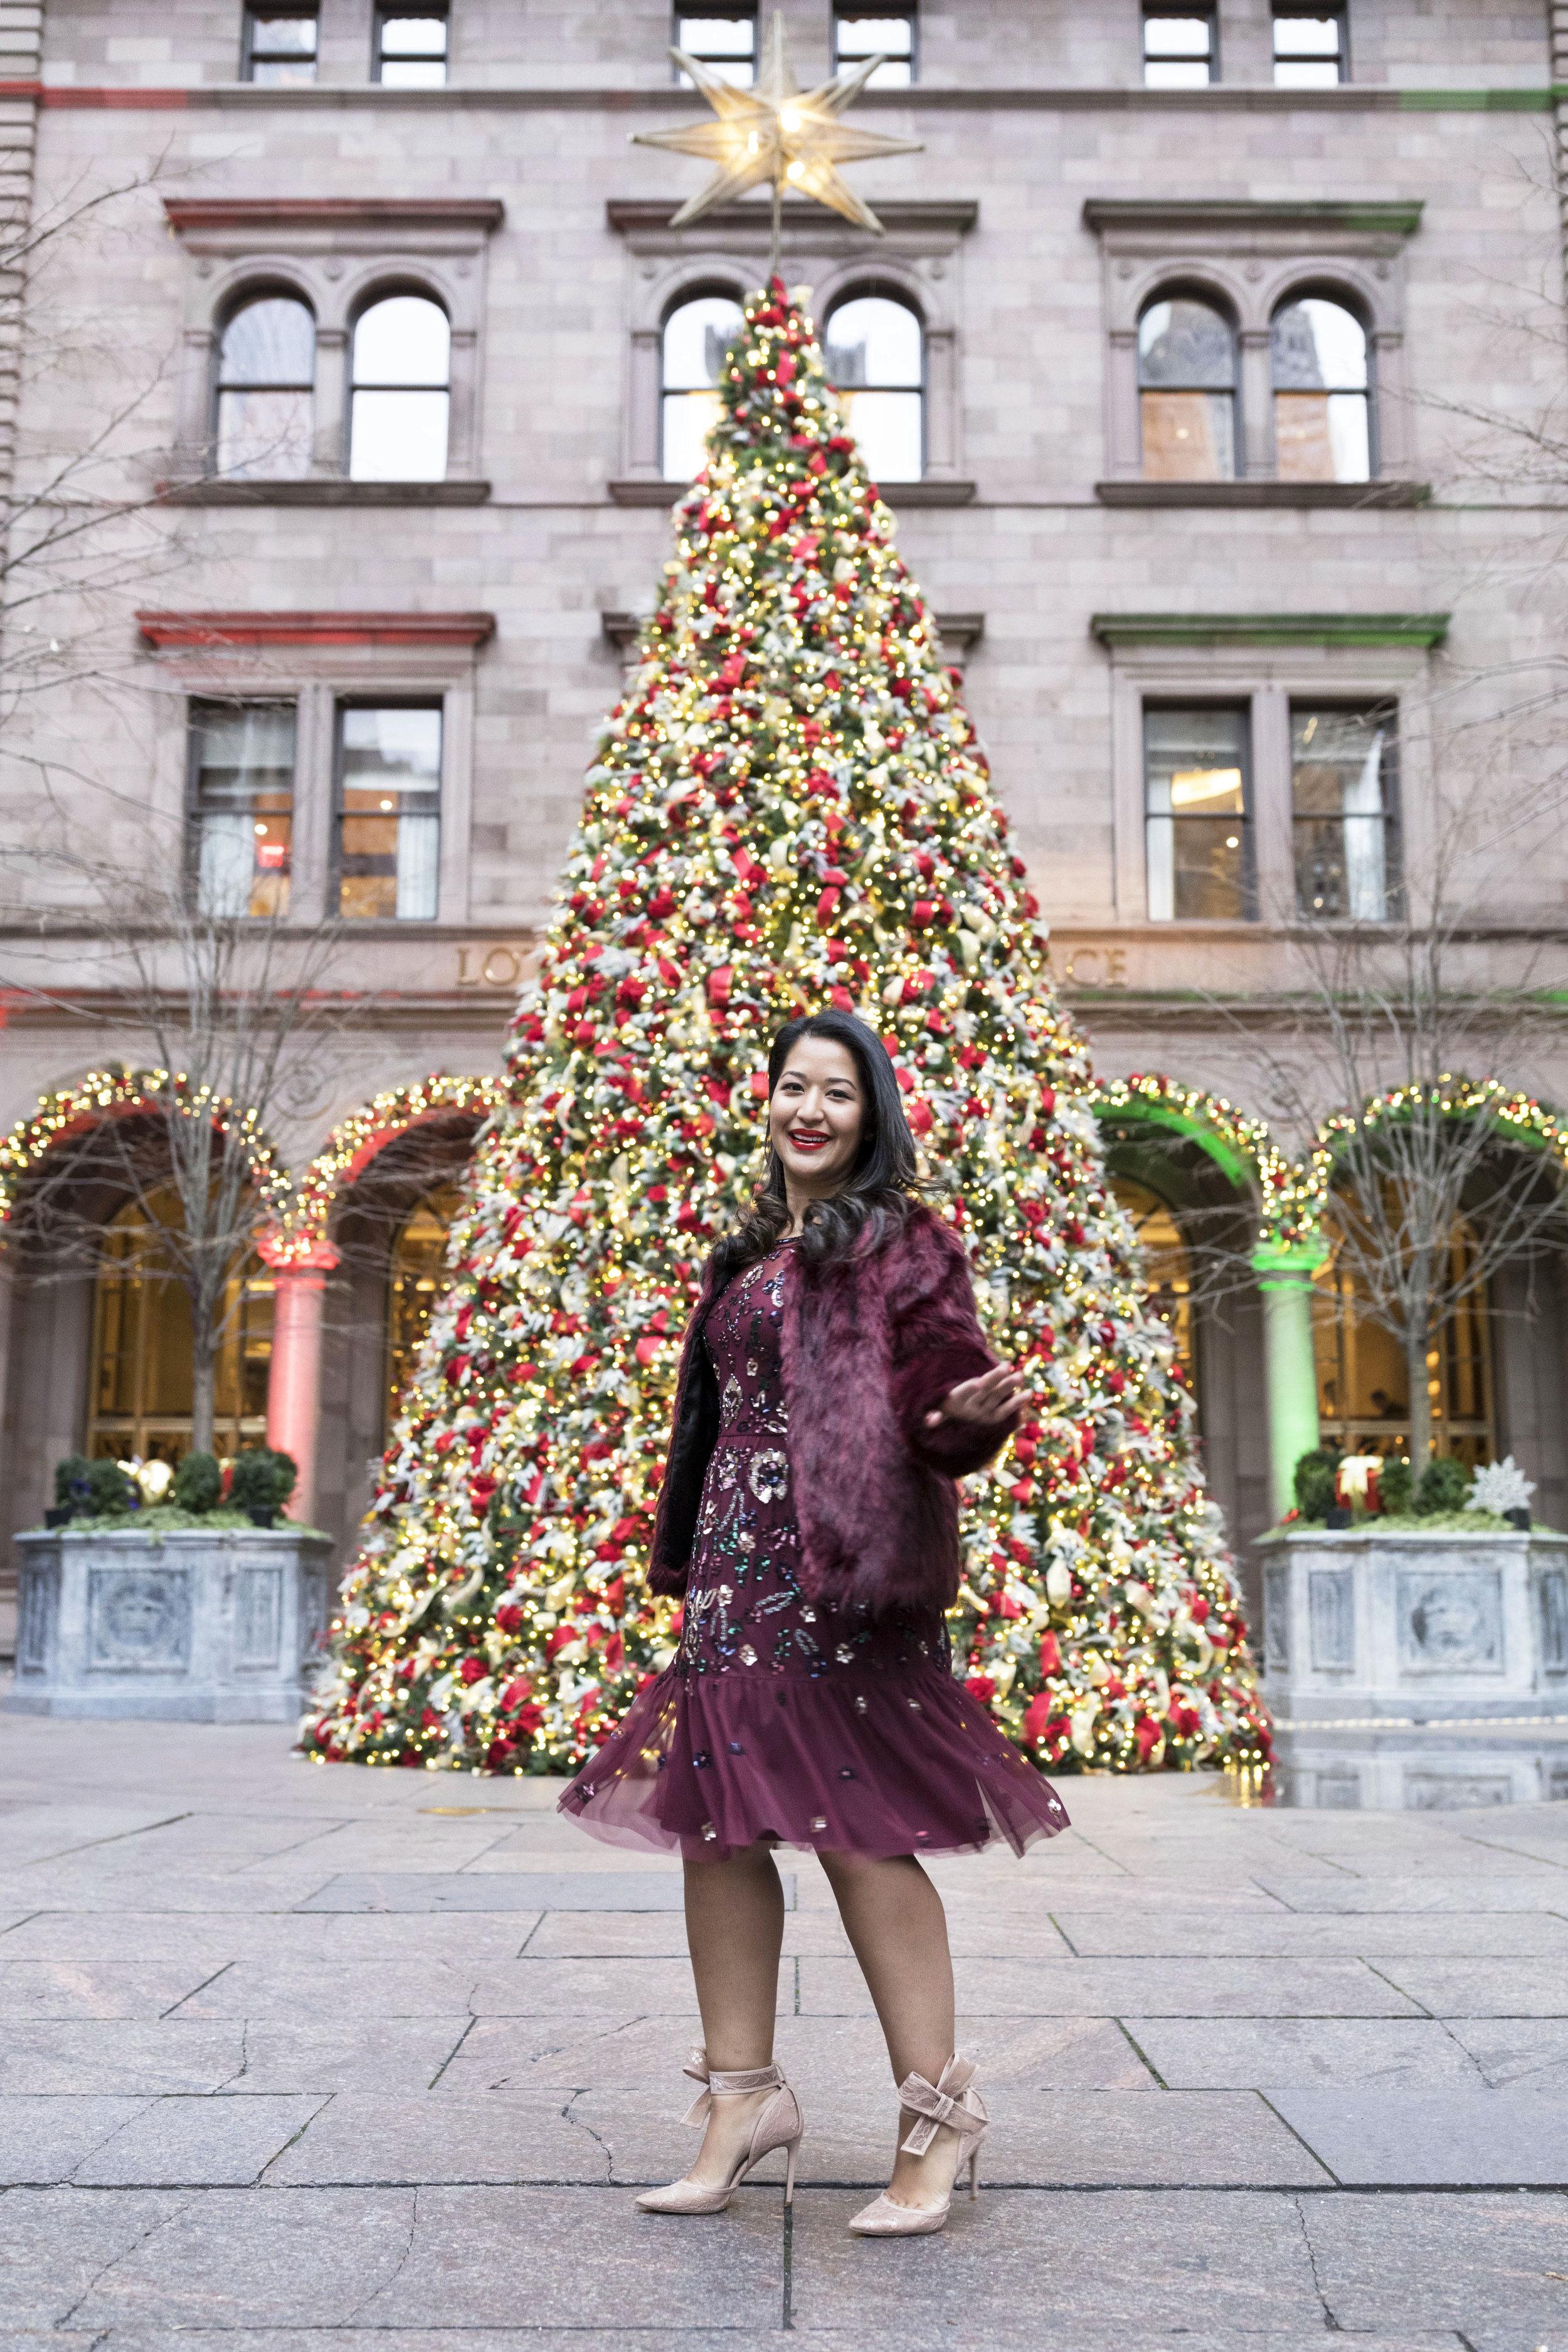 Krity S x Holiday Outfit x Aidan Beaded Burgundy Short Dress6.jpg